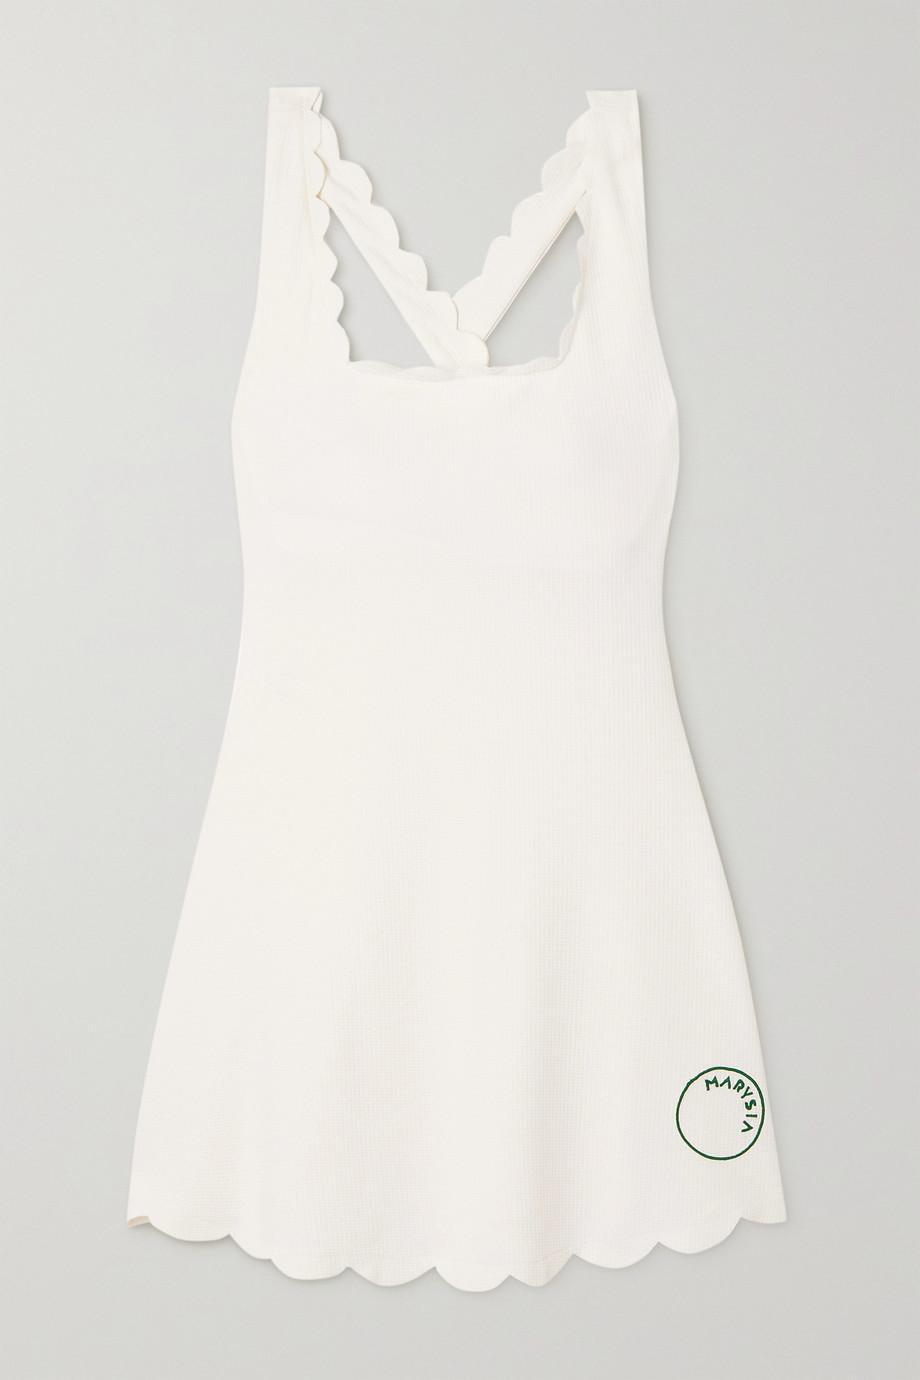 Marysia + NET SUSTAIN Serena scalloped recycled seersucker tennis dress